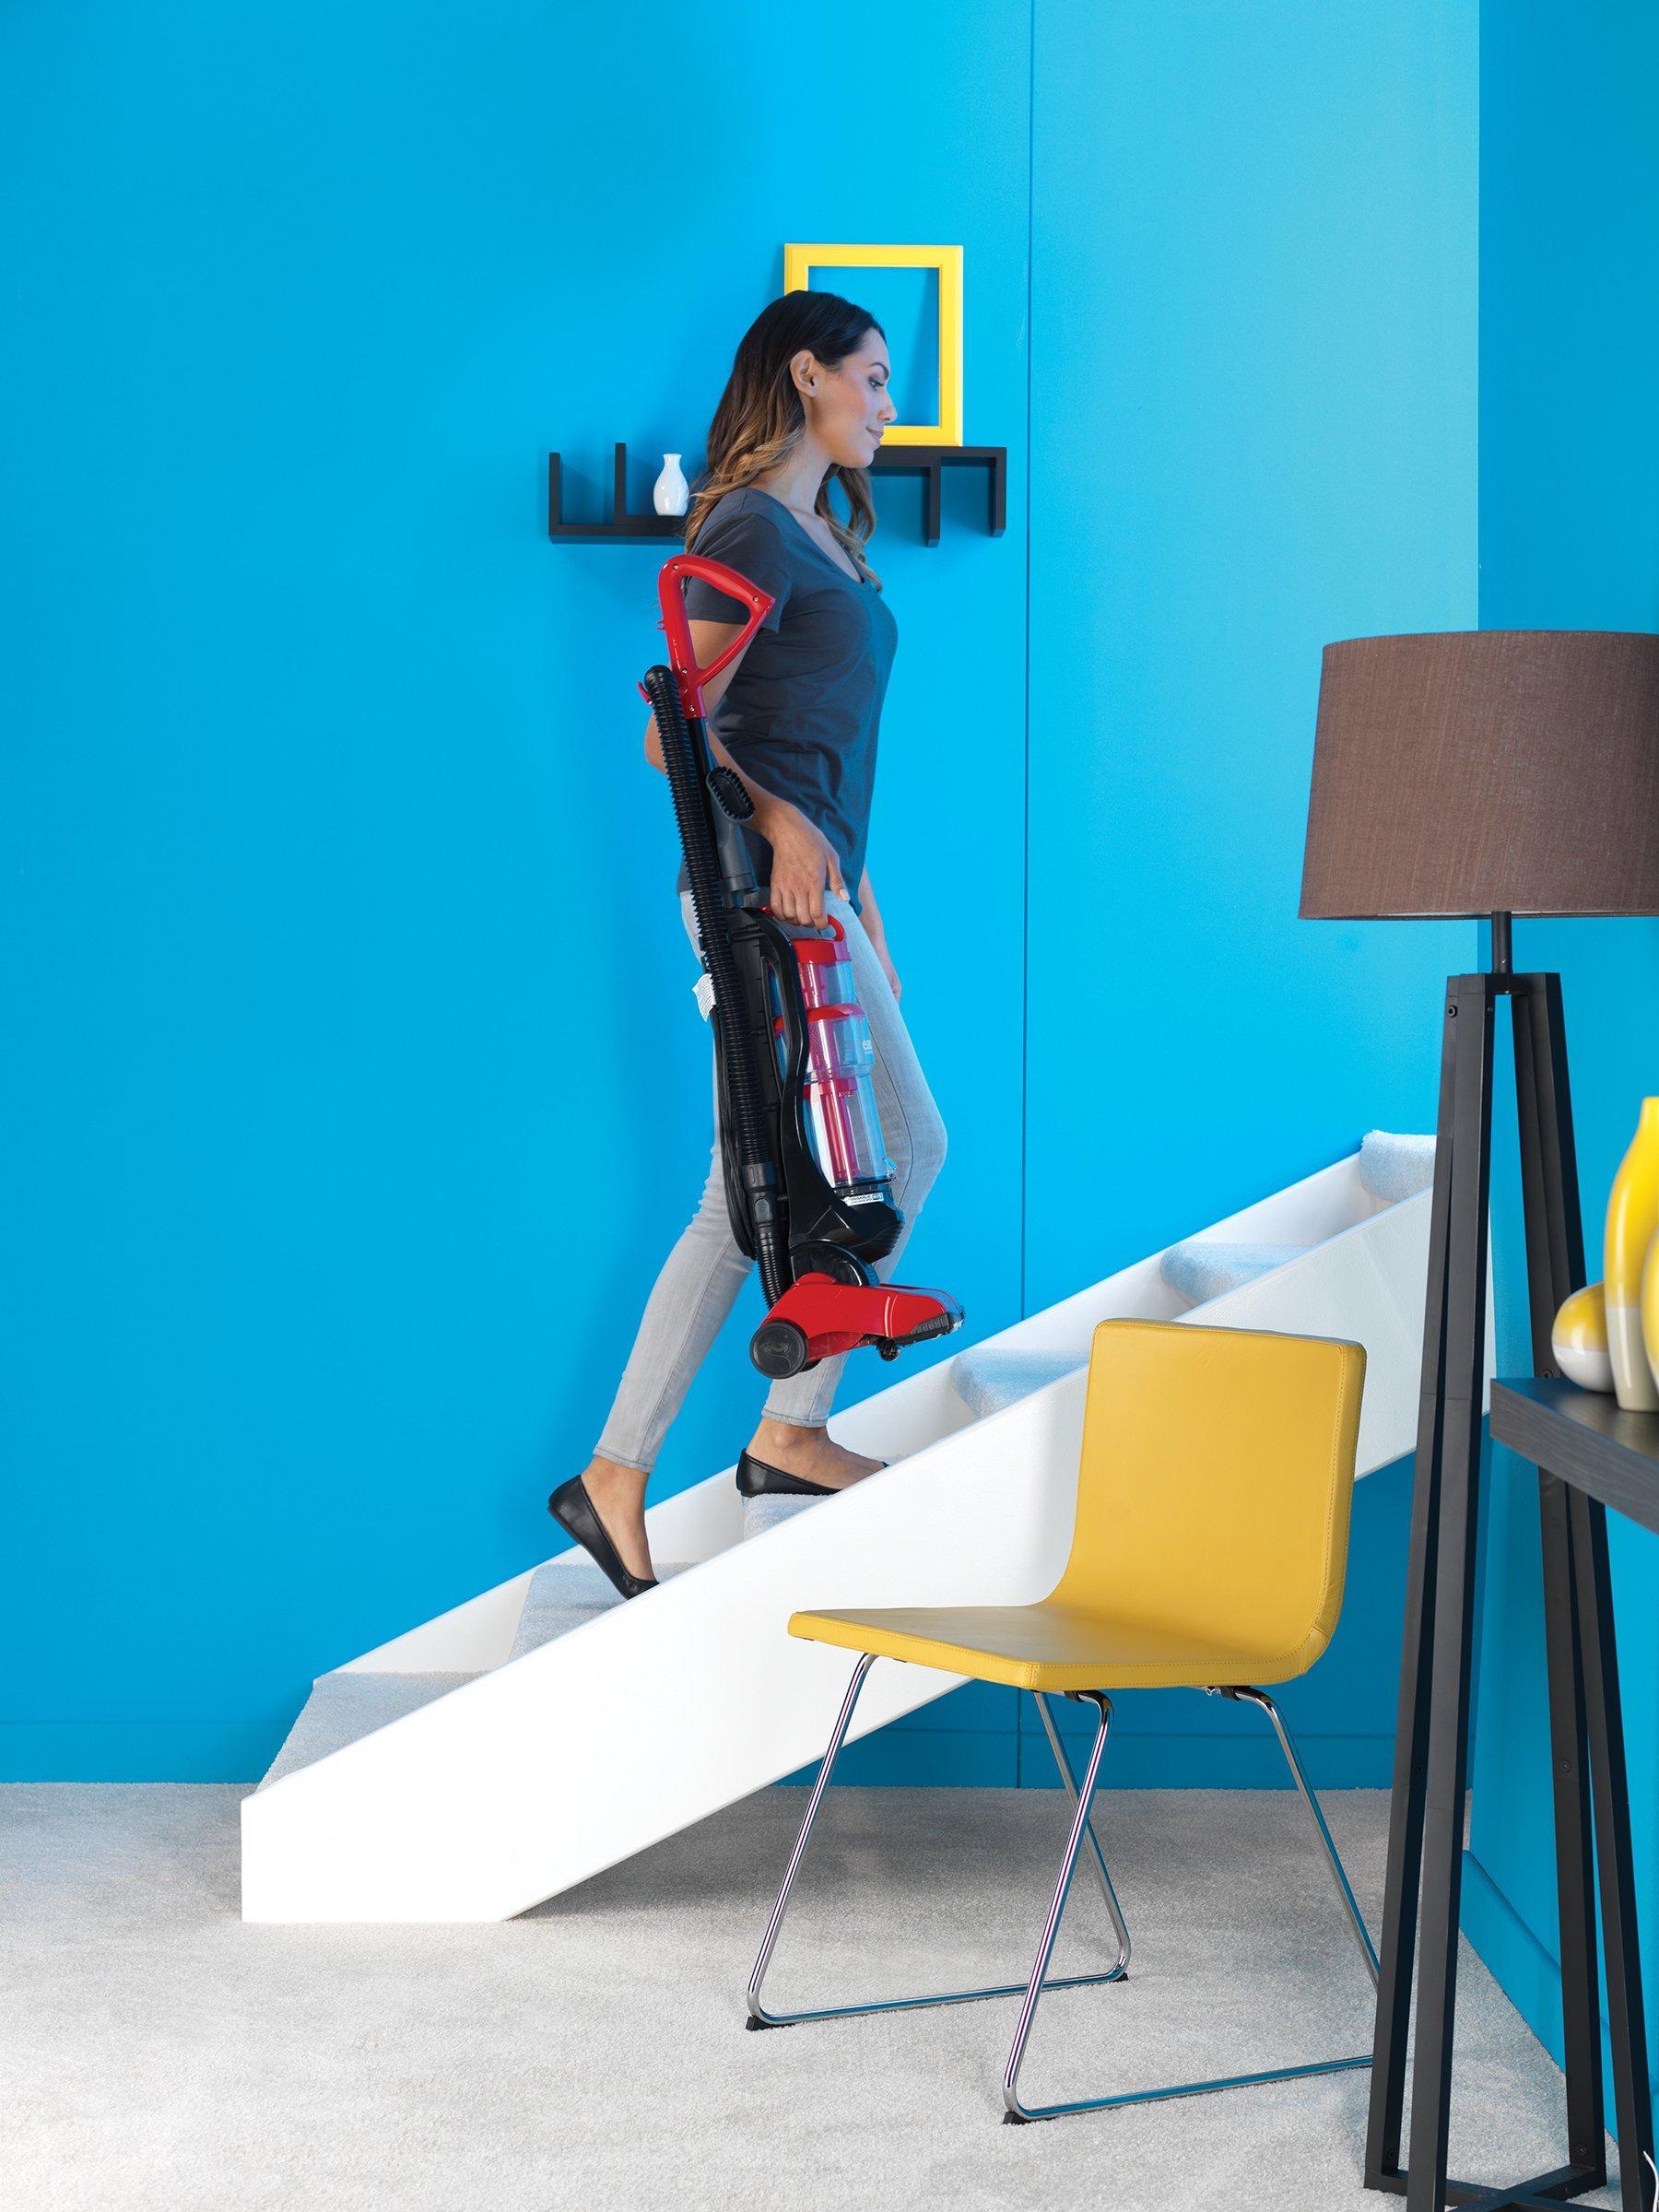 Easy Lite Cyclonic Upright Vacuum6